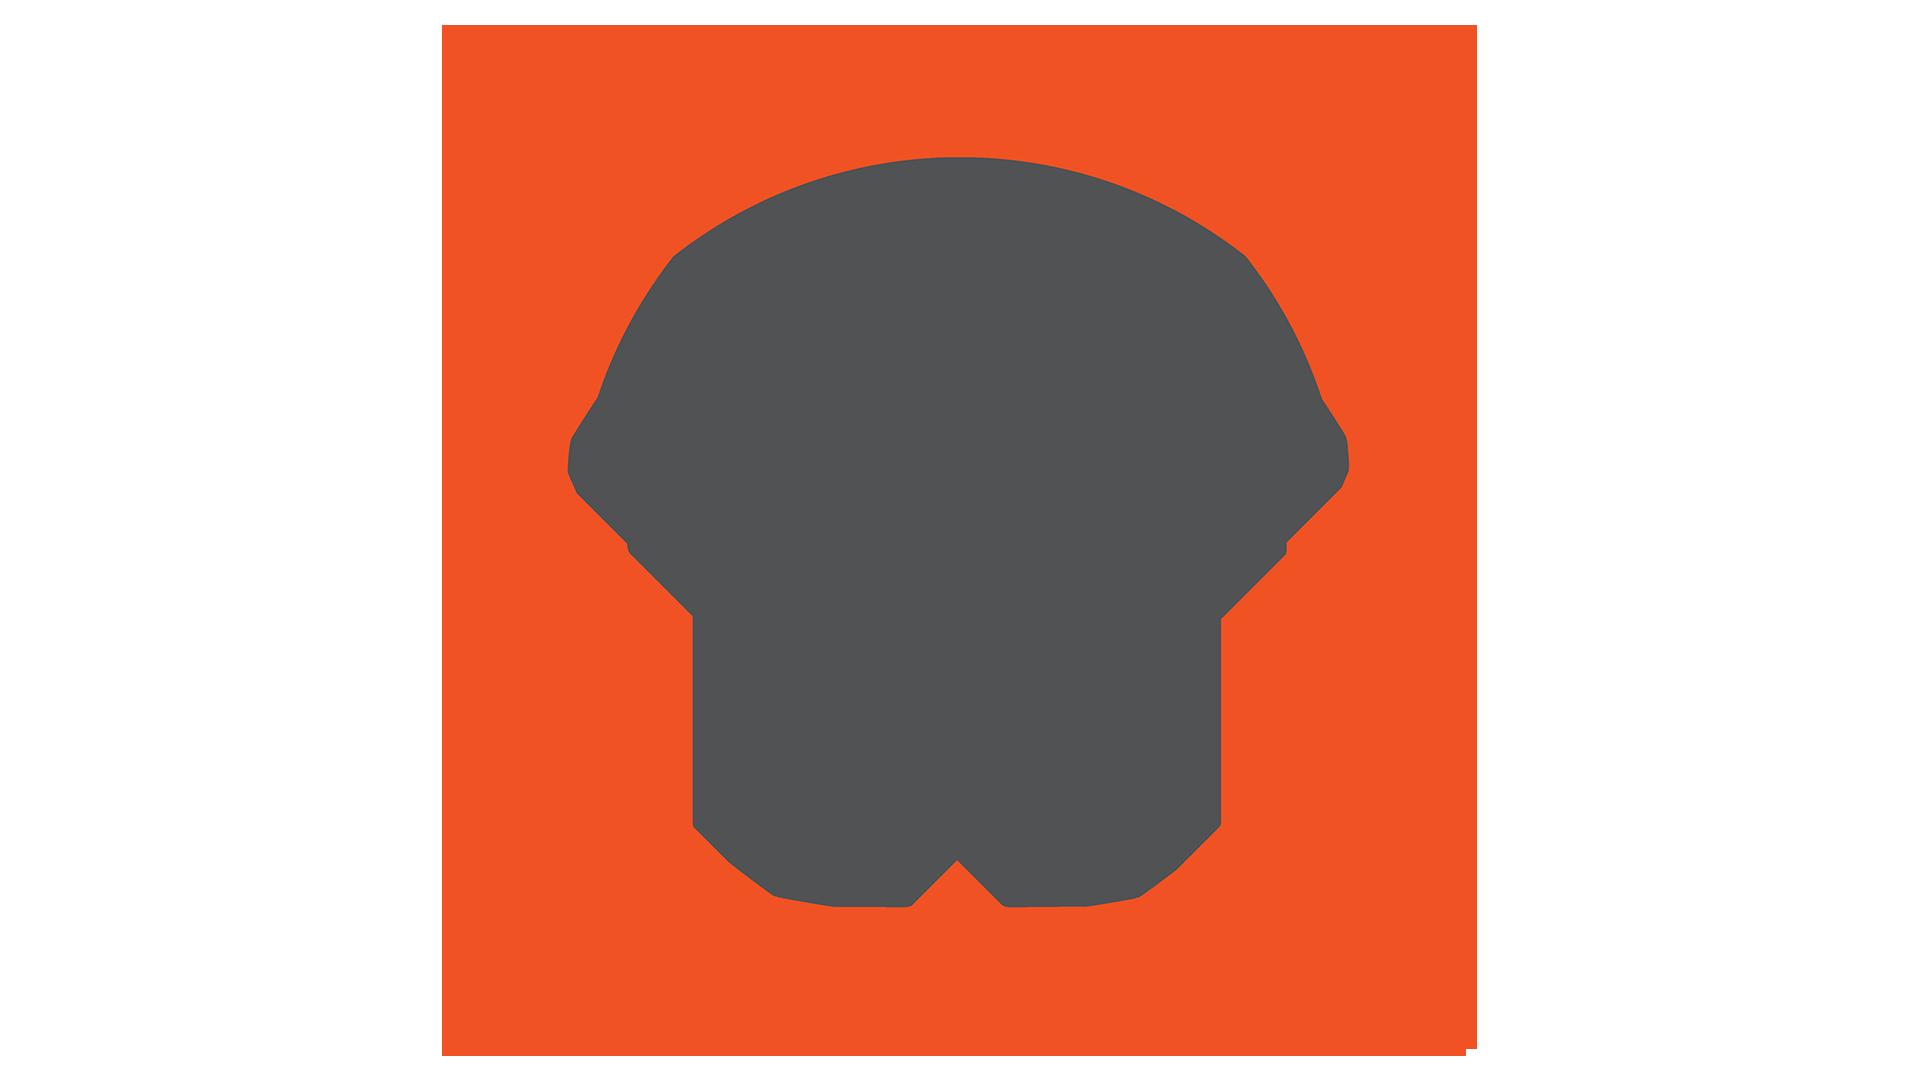 Transport Authorities_Symbols (1080p)